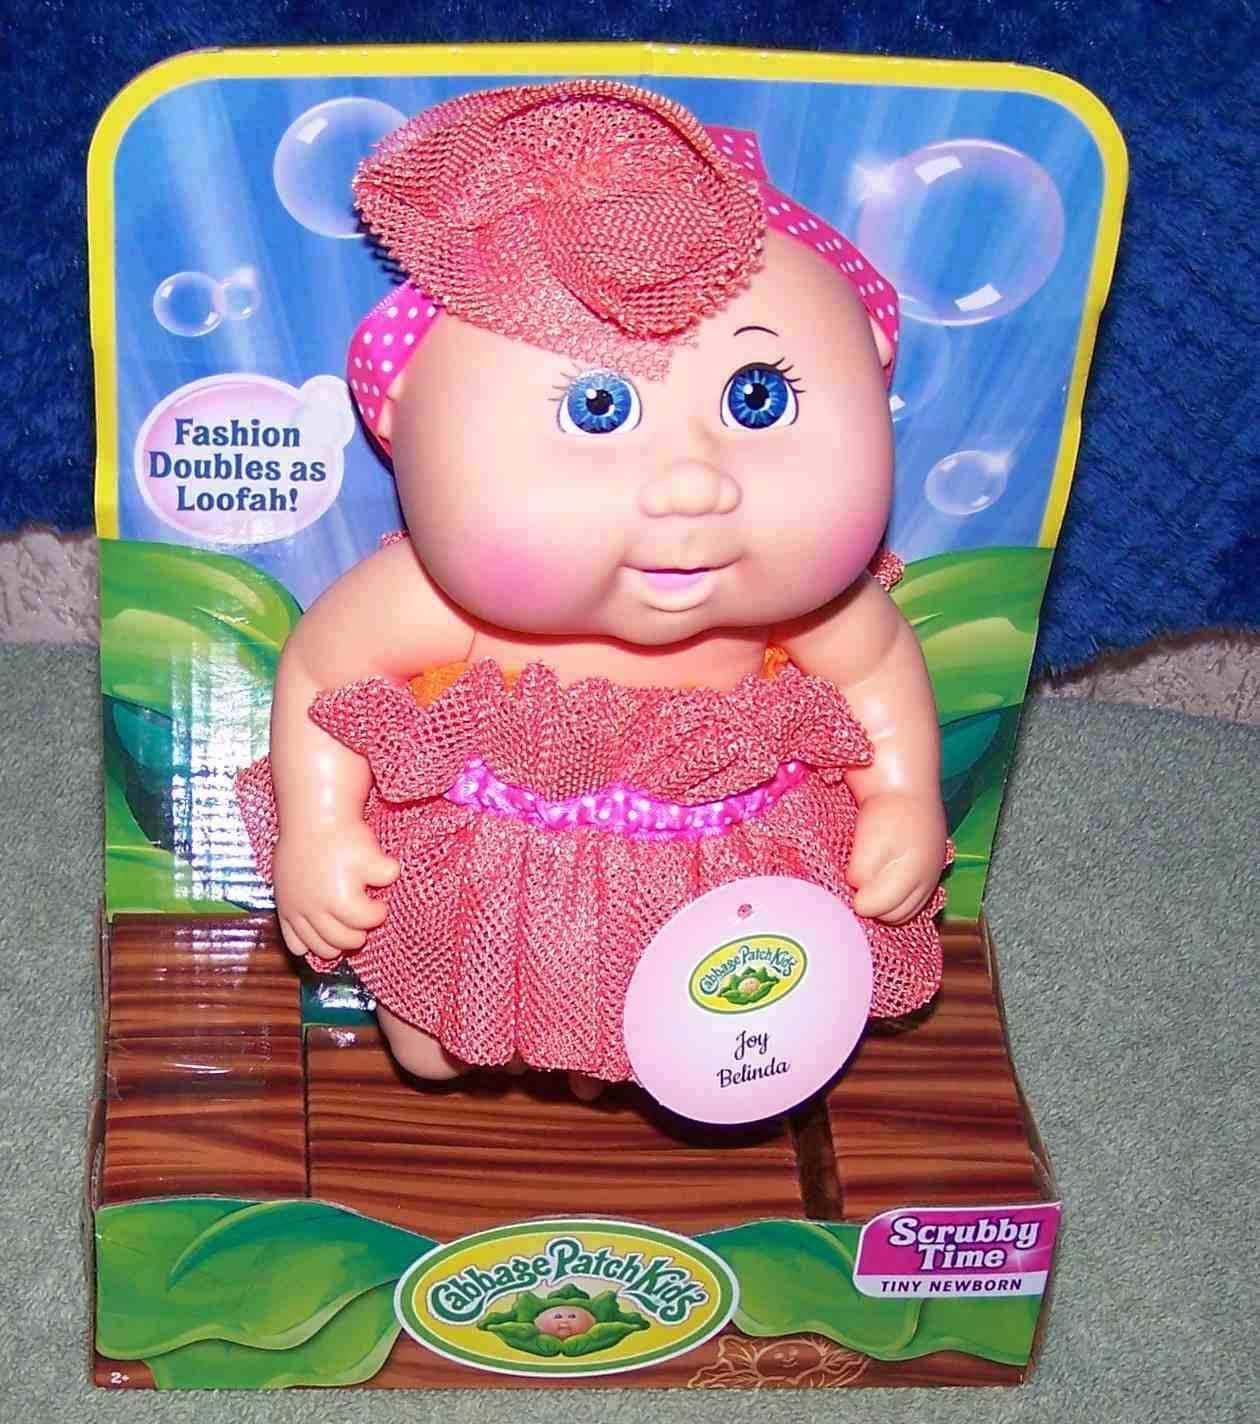 Cabbage Patch Kids Scrubby Time Tiny Newborn Doll 10